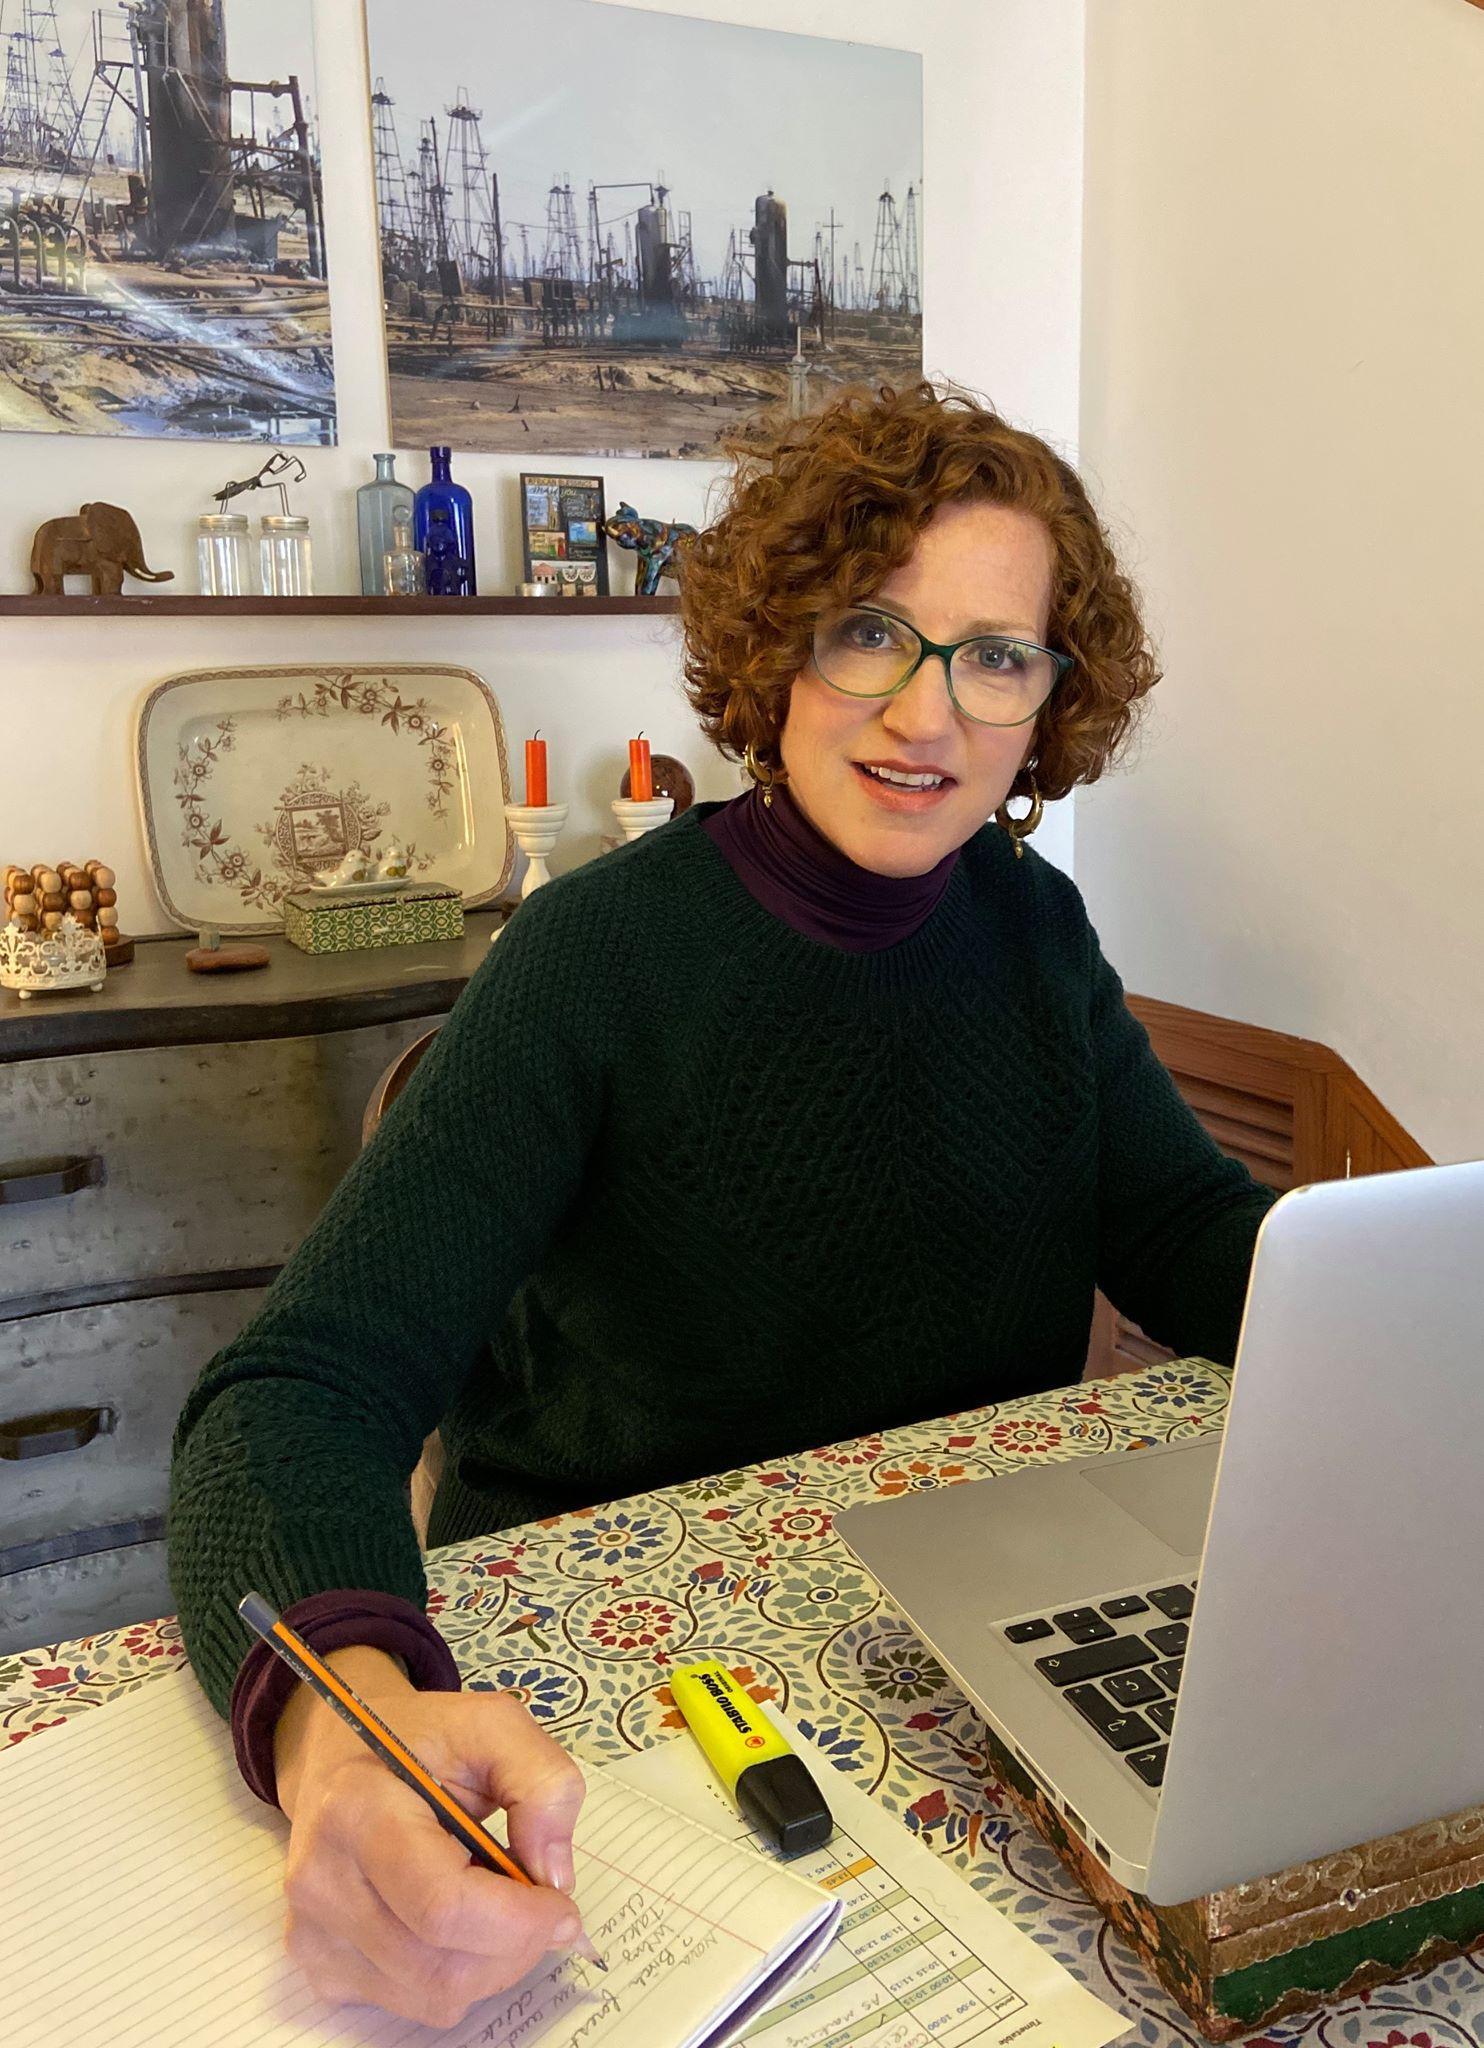 Art teacher Lawrie teaching her Palma College students